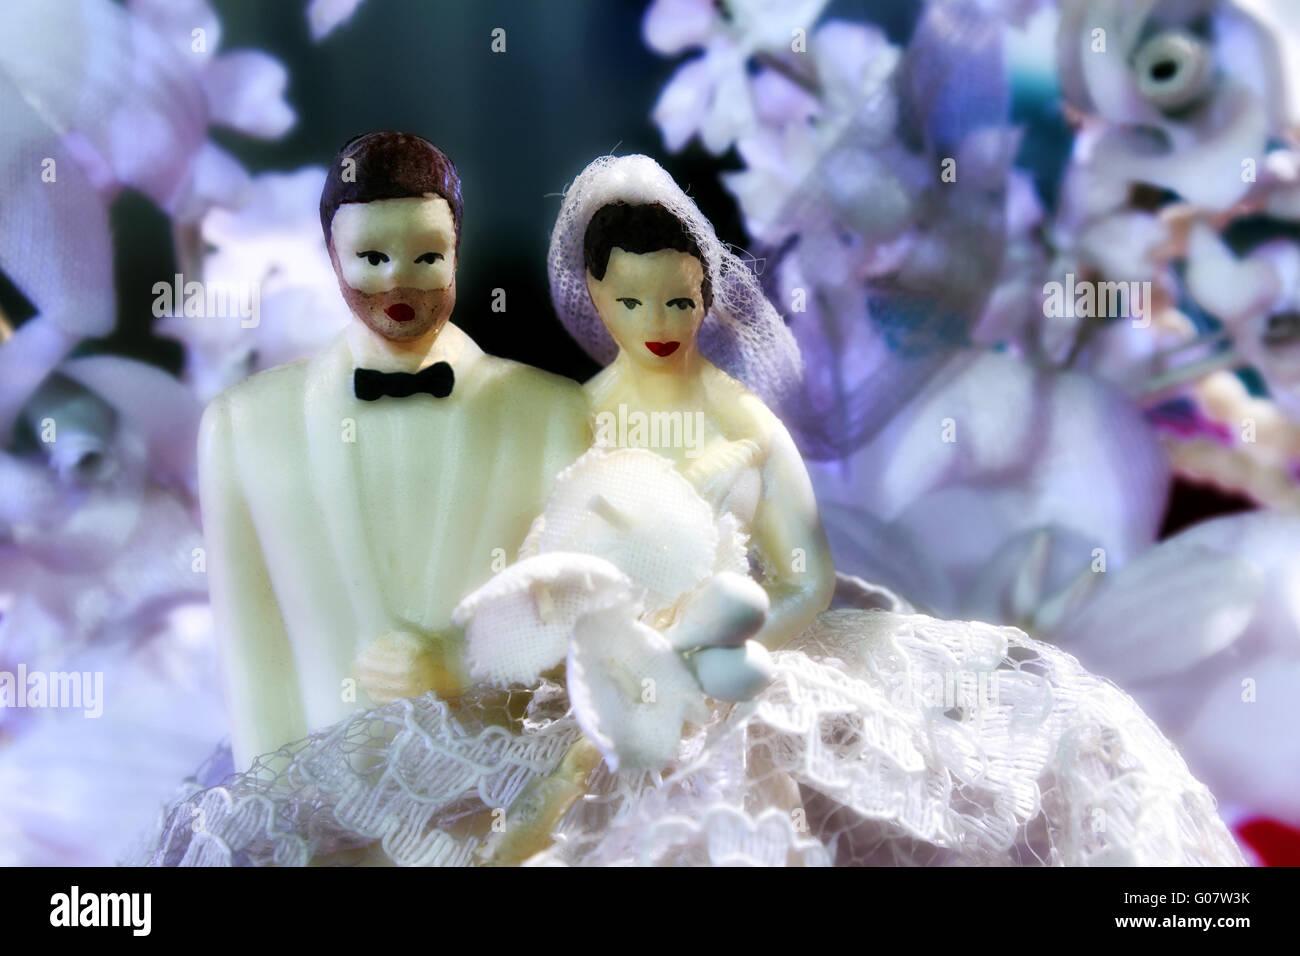 Ceremony decoration ornaments wedding stock photos ceremony wedding decoration stock image junglespirit Gallery